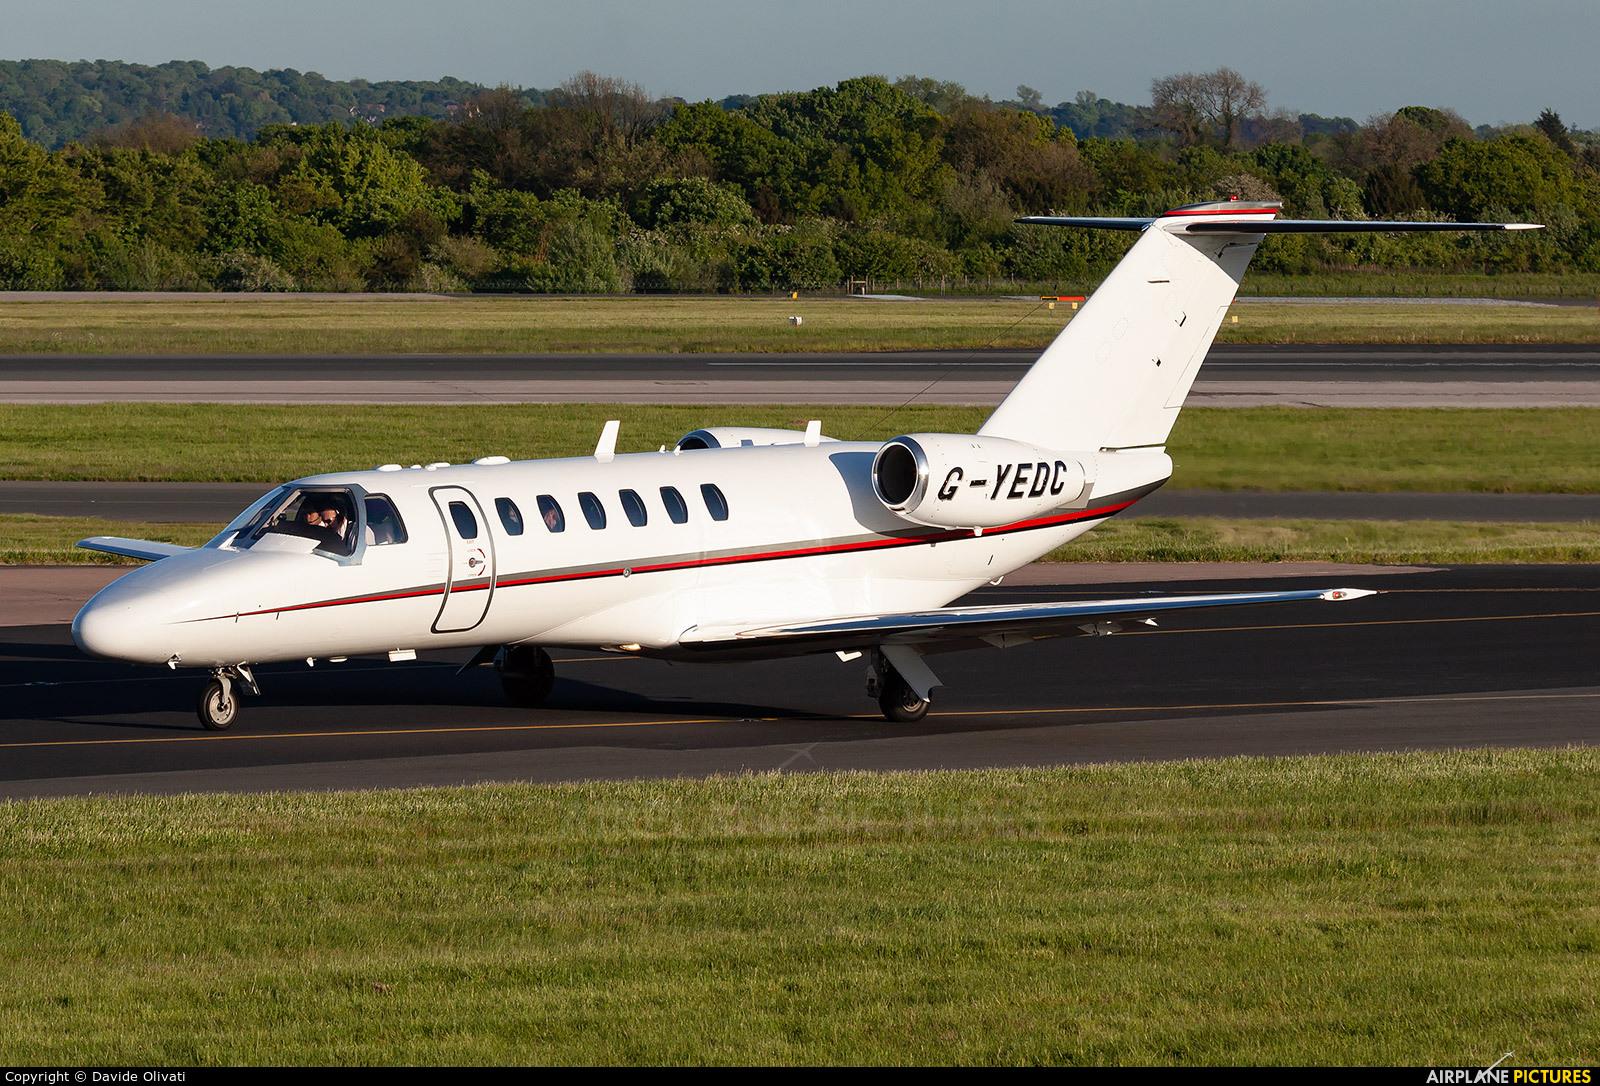 Air Charter Scotland G-YEDC aircraft at Manchester